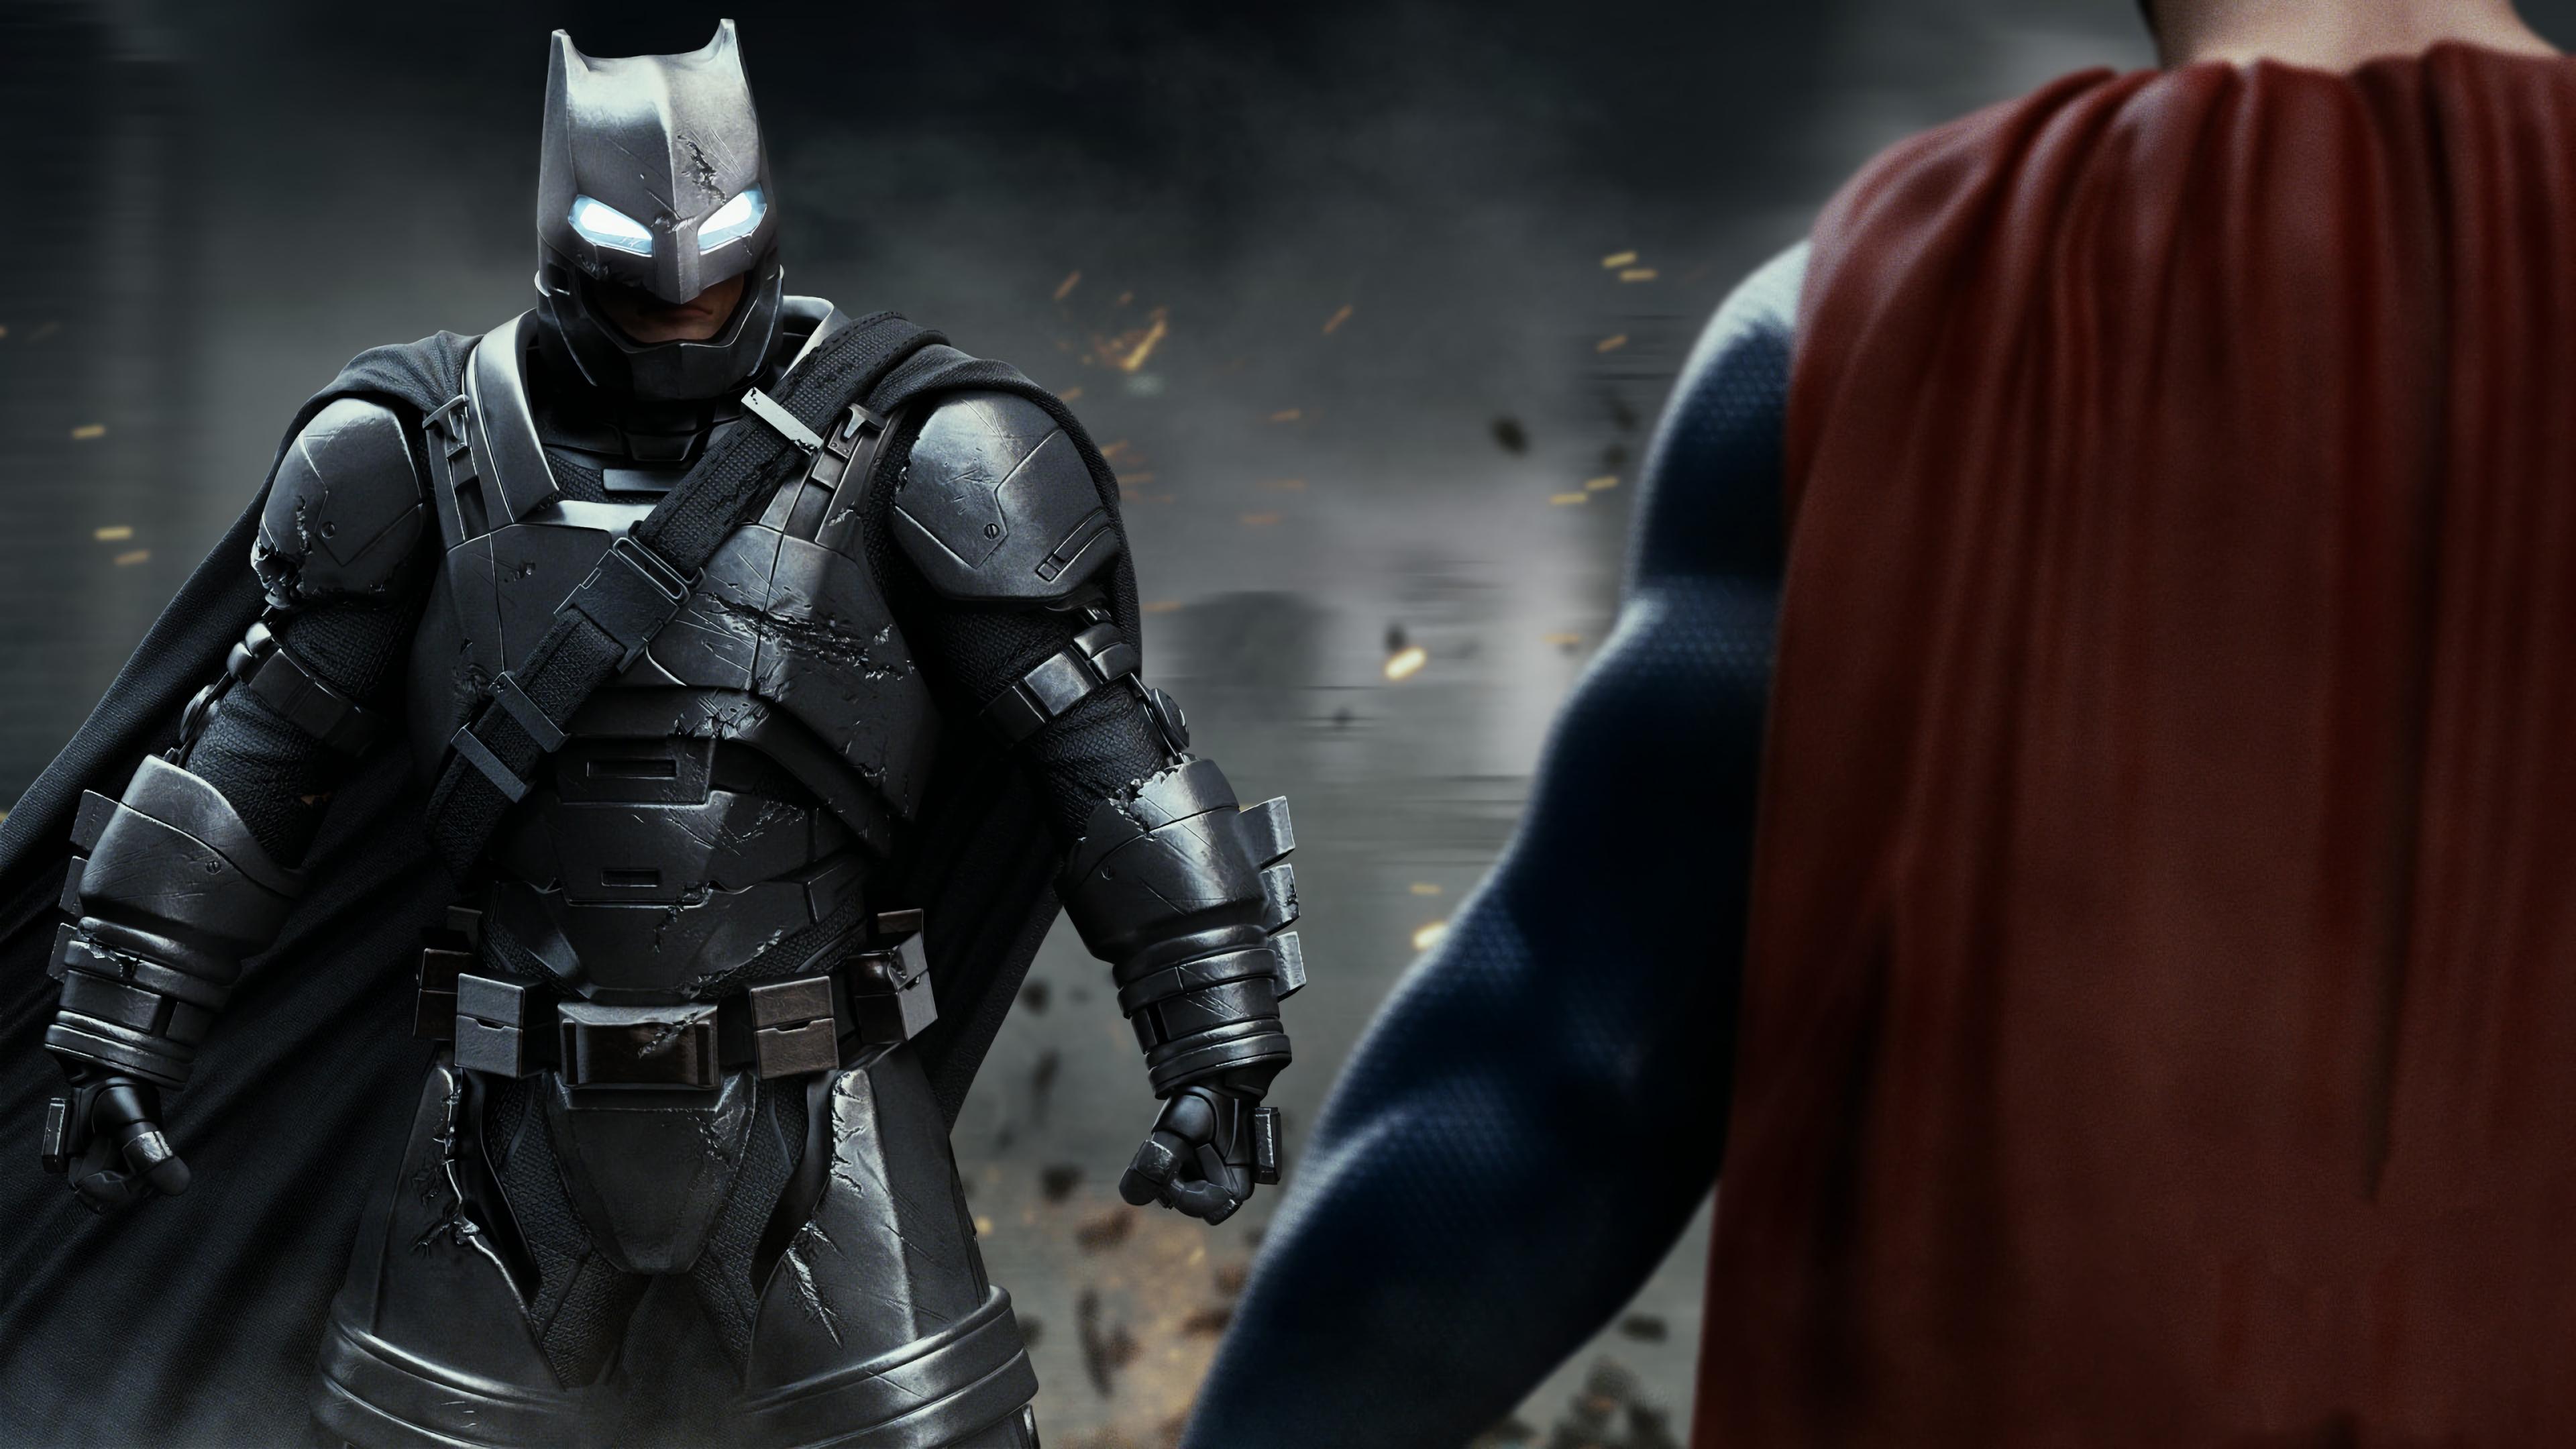 batman vs superman art 1568054092 - Batman Vs Superman Art - superman wallpapers, superheroes wallpapers, hd-wallpapers, digital art wallpapers, batman wallpapers, artwork wallpapers, 4k-wallpapers